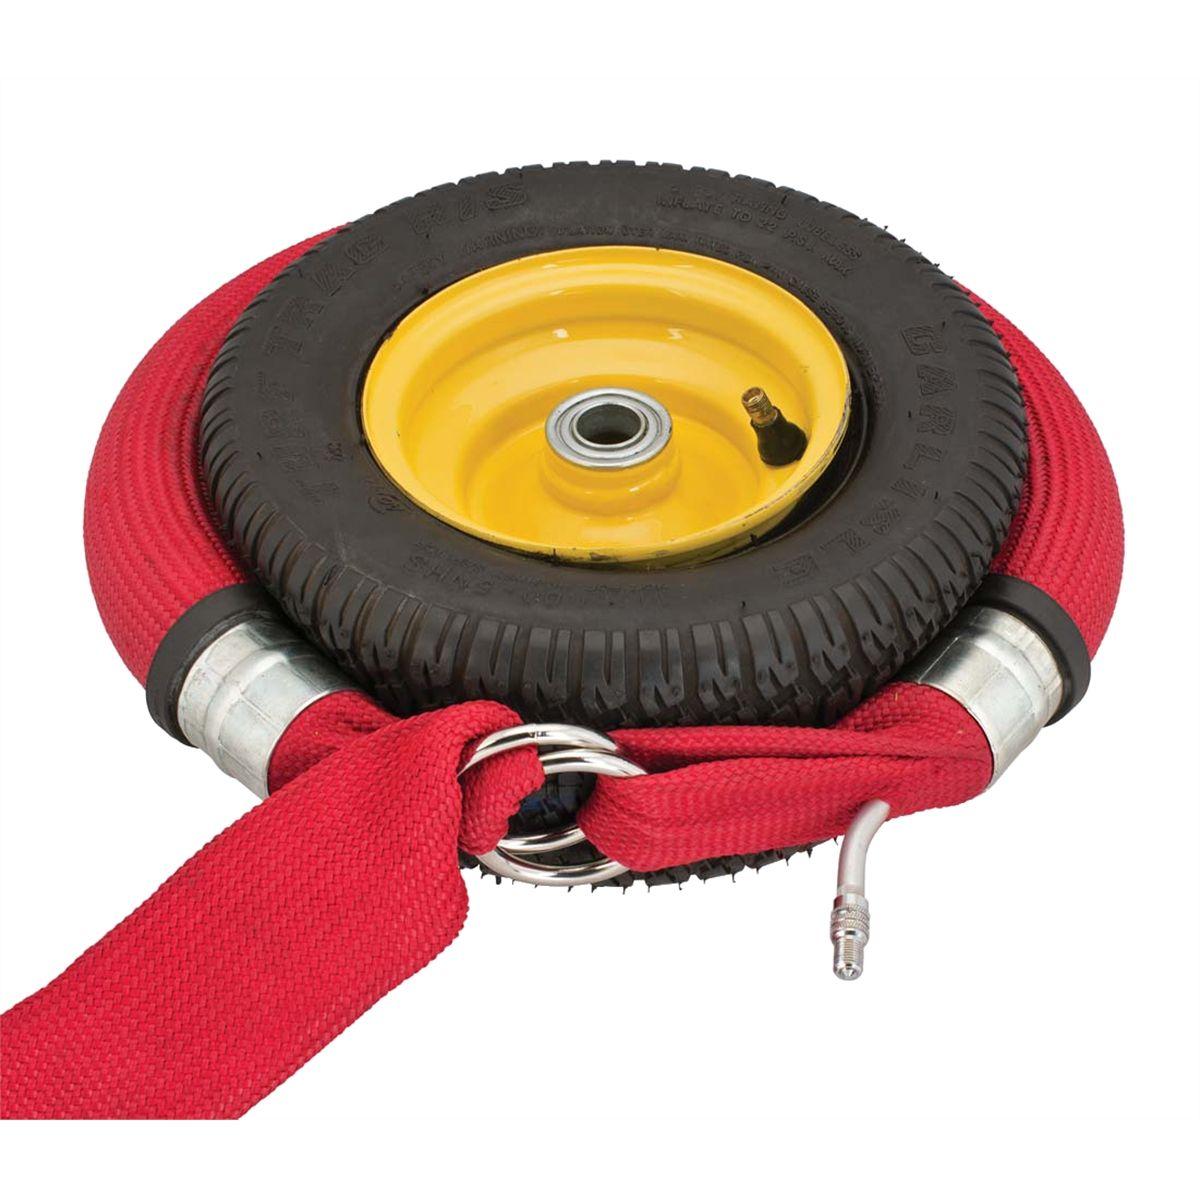 T131 Utility Tire Air Powered Bead Expander Ken Tool 31431